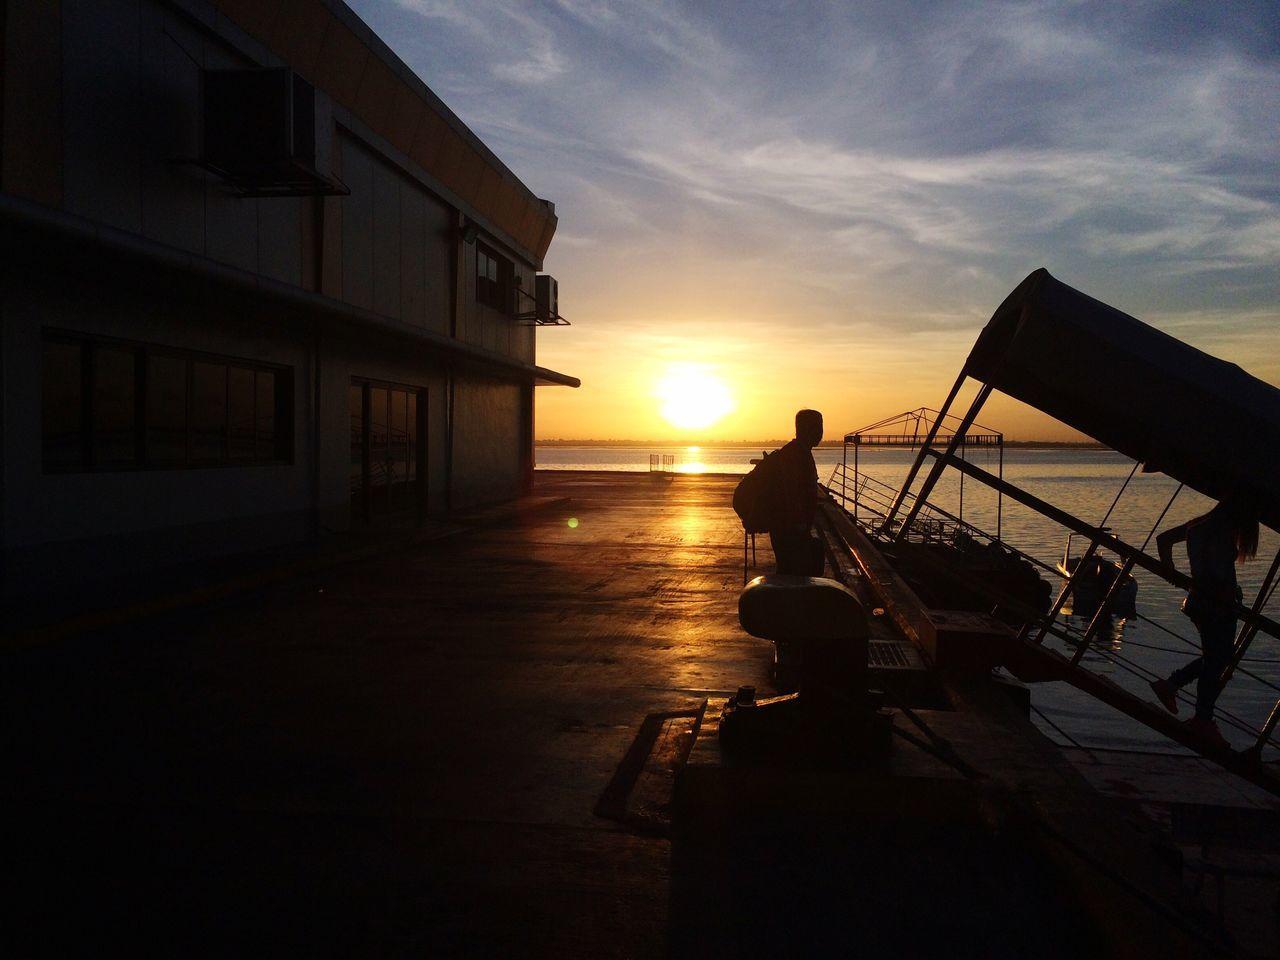 Sunrise Port Of Cebu Fastcraft Barge Leaving Vacation Bohol Summer End Of Summer Docking Bay People And Places